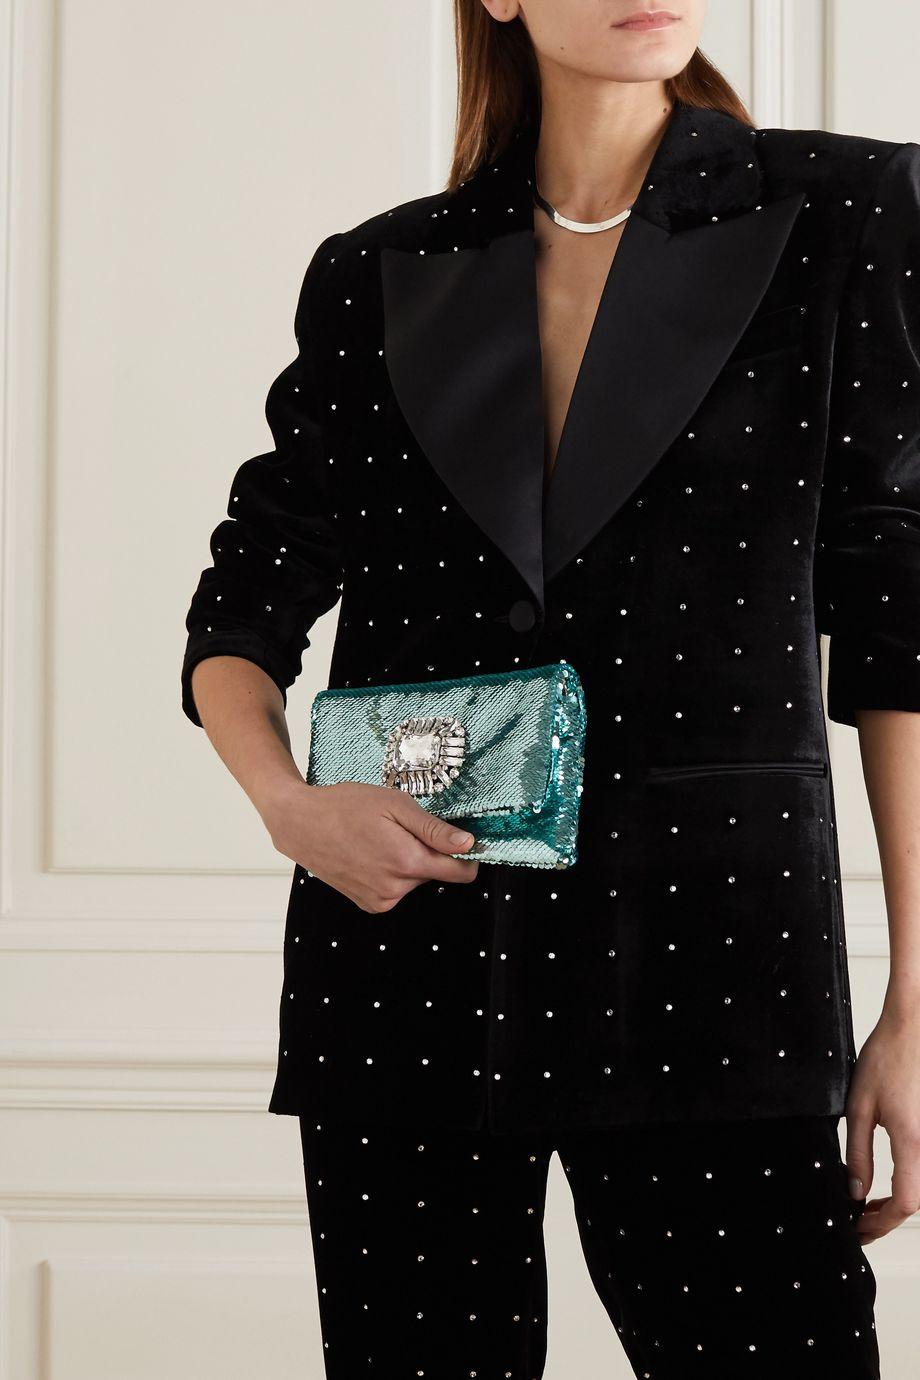 Jimmy Choo Titania crystal-embellished sequined satin clutch